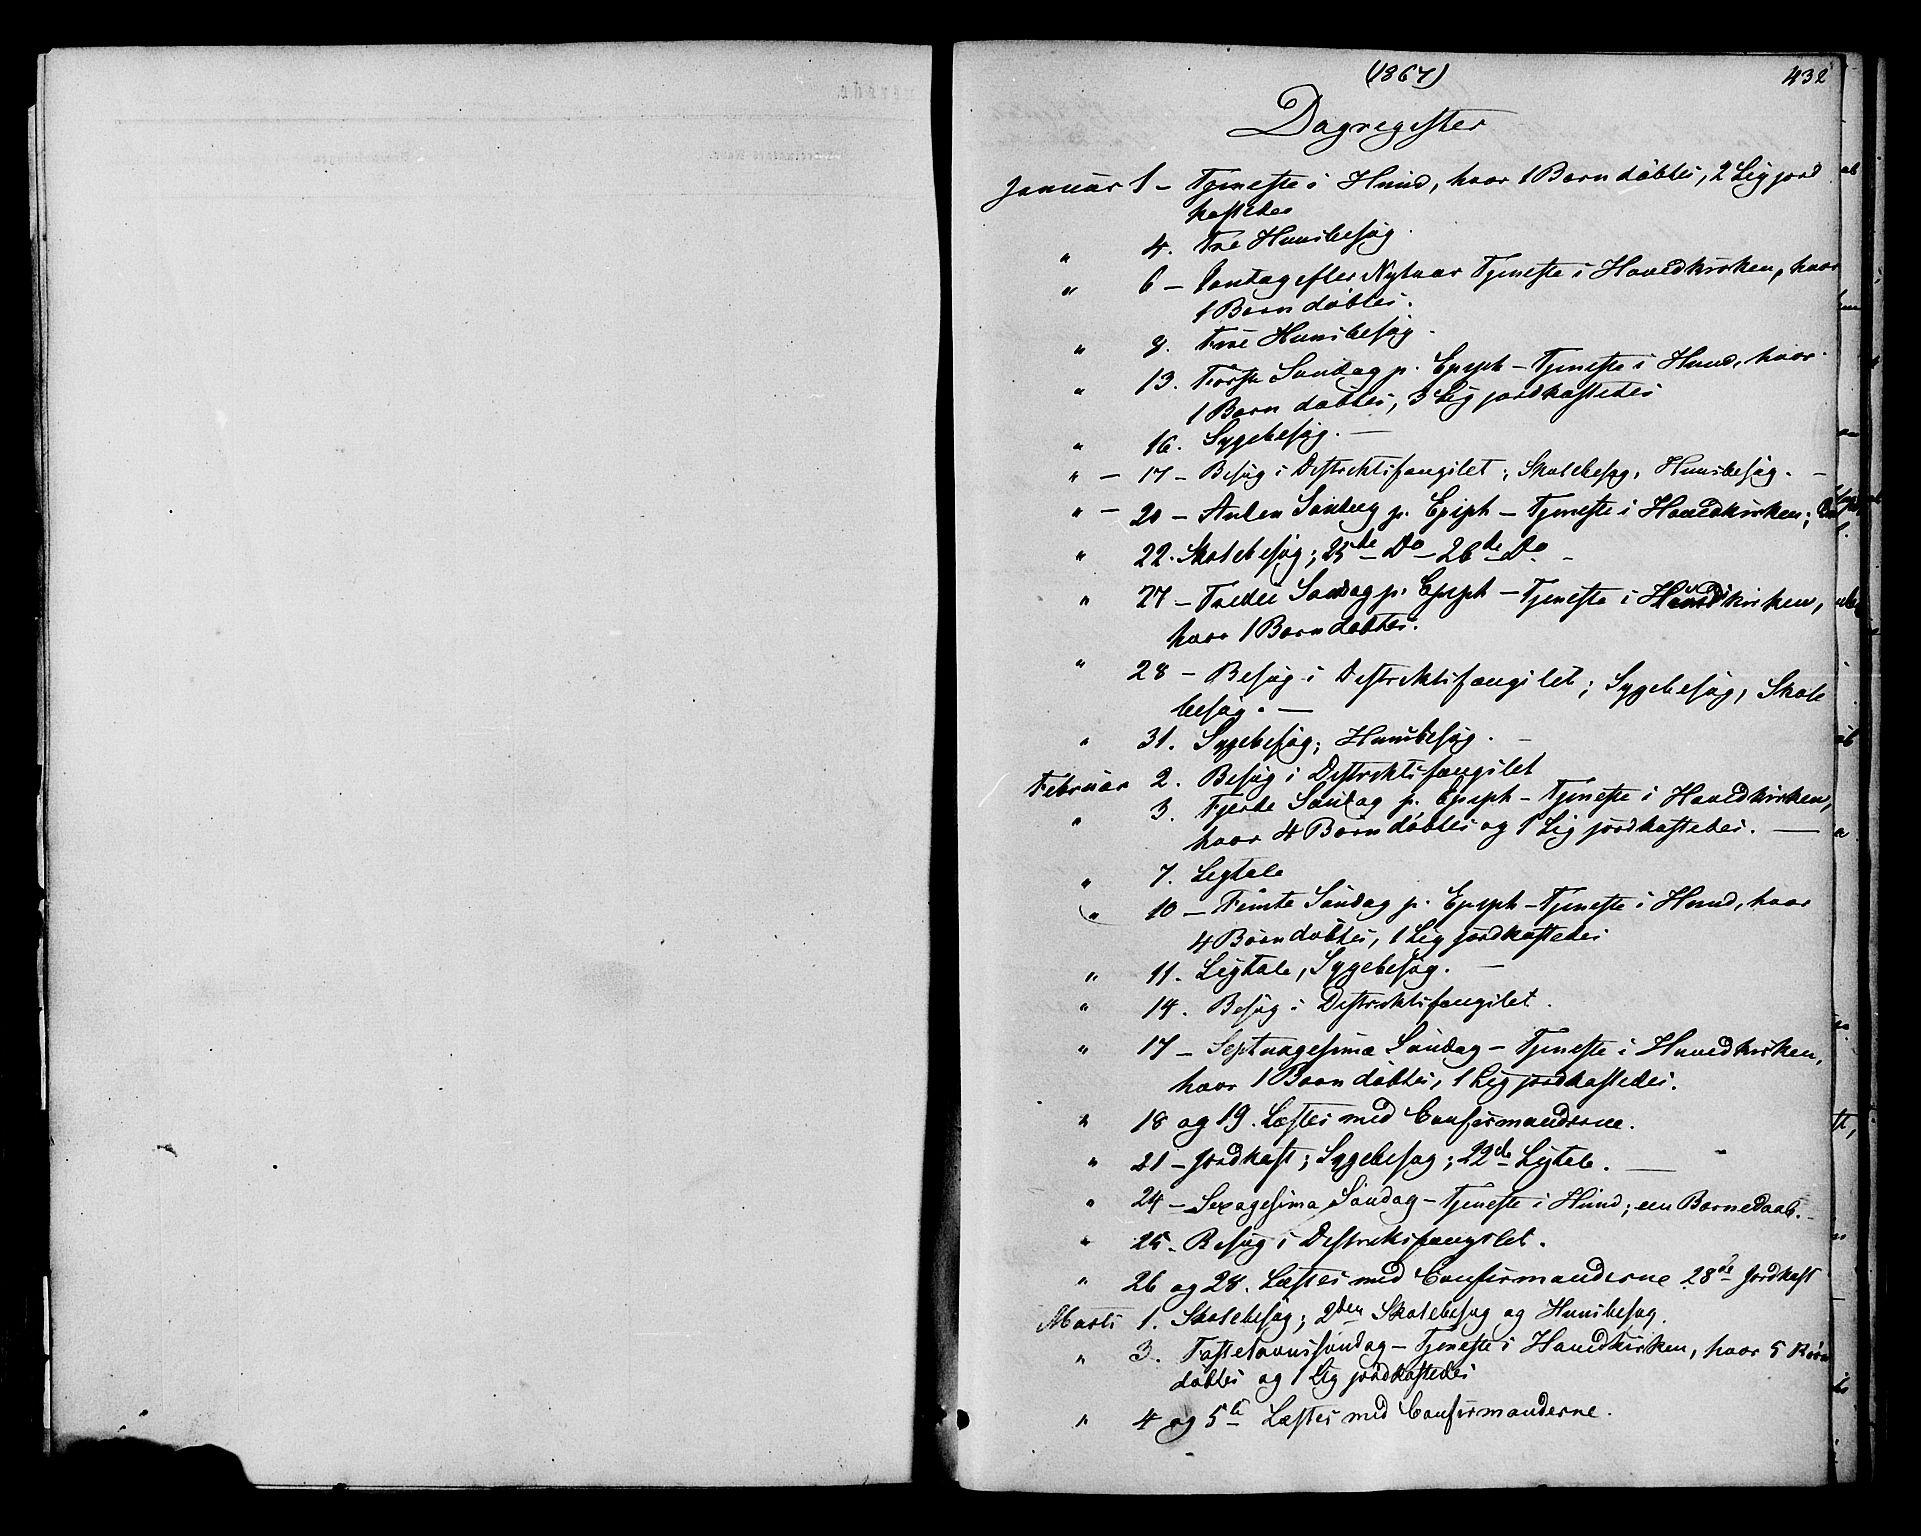 SAH, Vardal prestekontor, H/Ha/Haa/L0007: Ministerialbok nr. 7, 1867-1878, s. 432